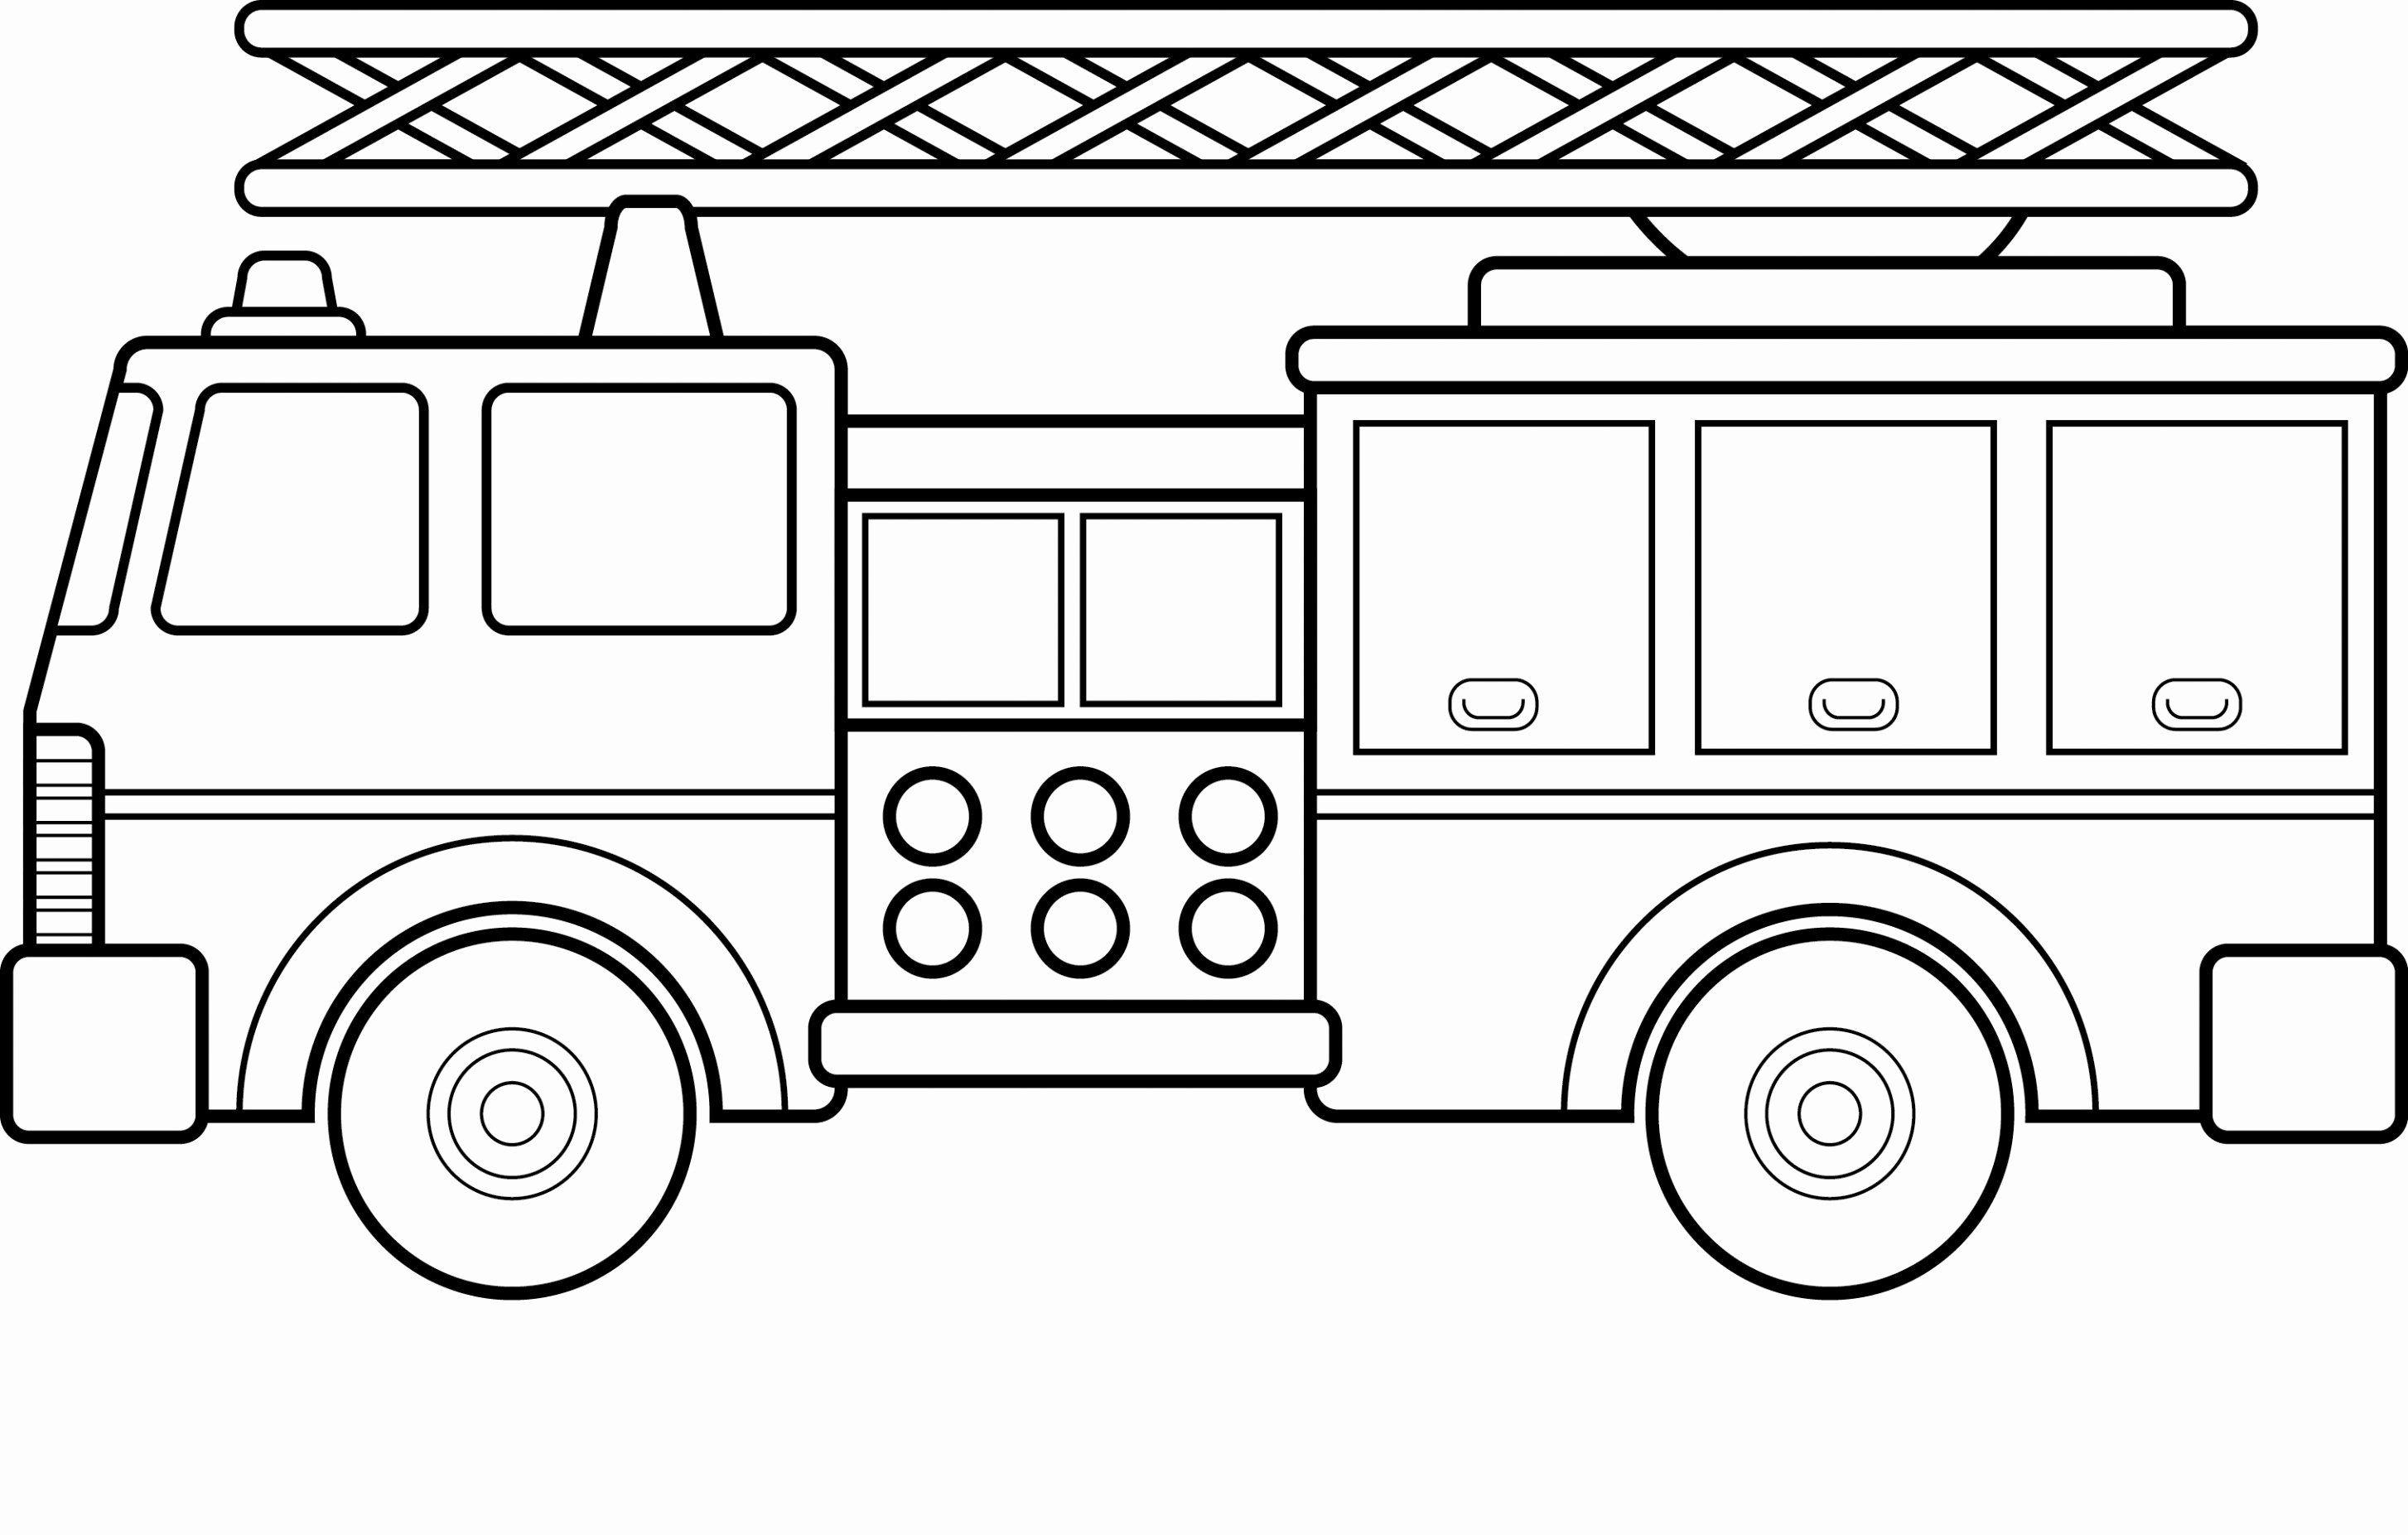 Garbage Truck Coloring Sheet Best Of Dump Truck Coloring Pages Warna Halaman Mewarnai Gambar